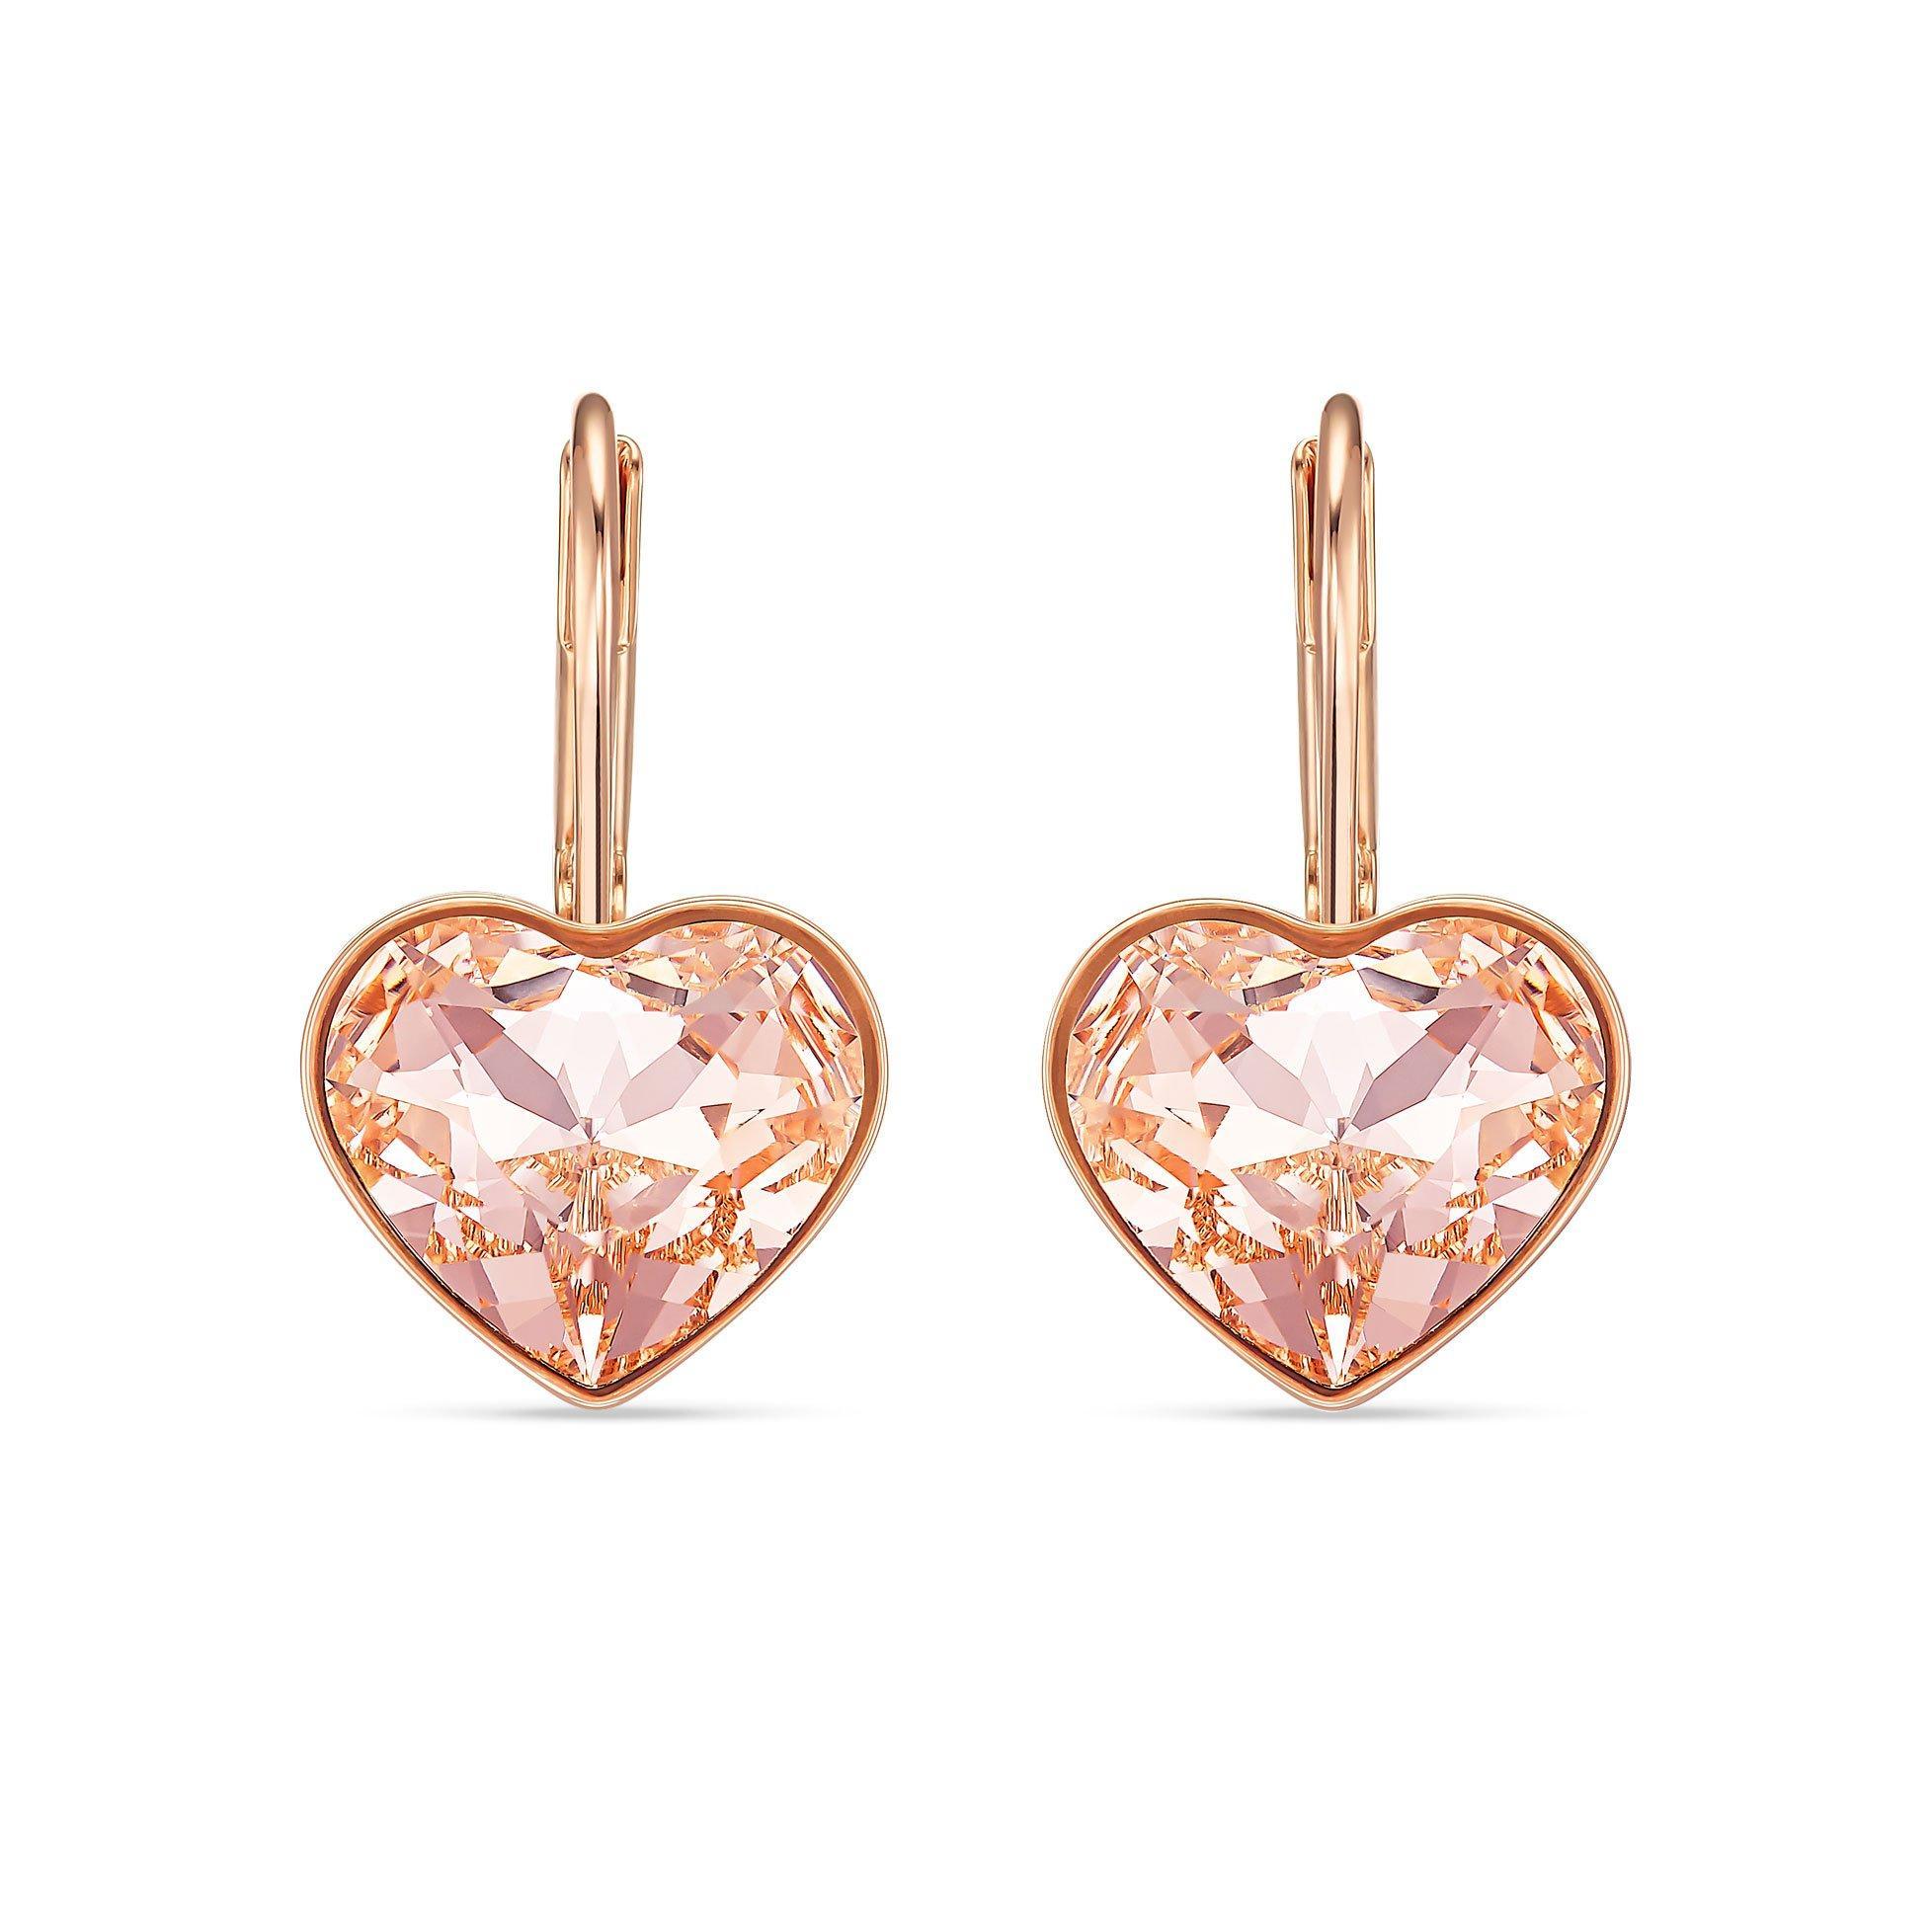 Swarovski Bella Rose Gold Tone Heart Earrings